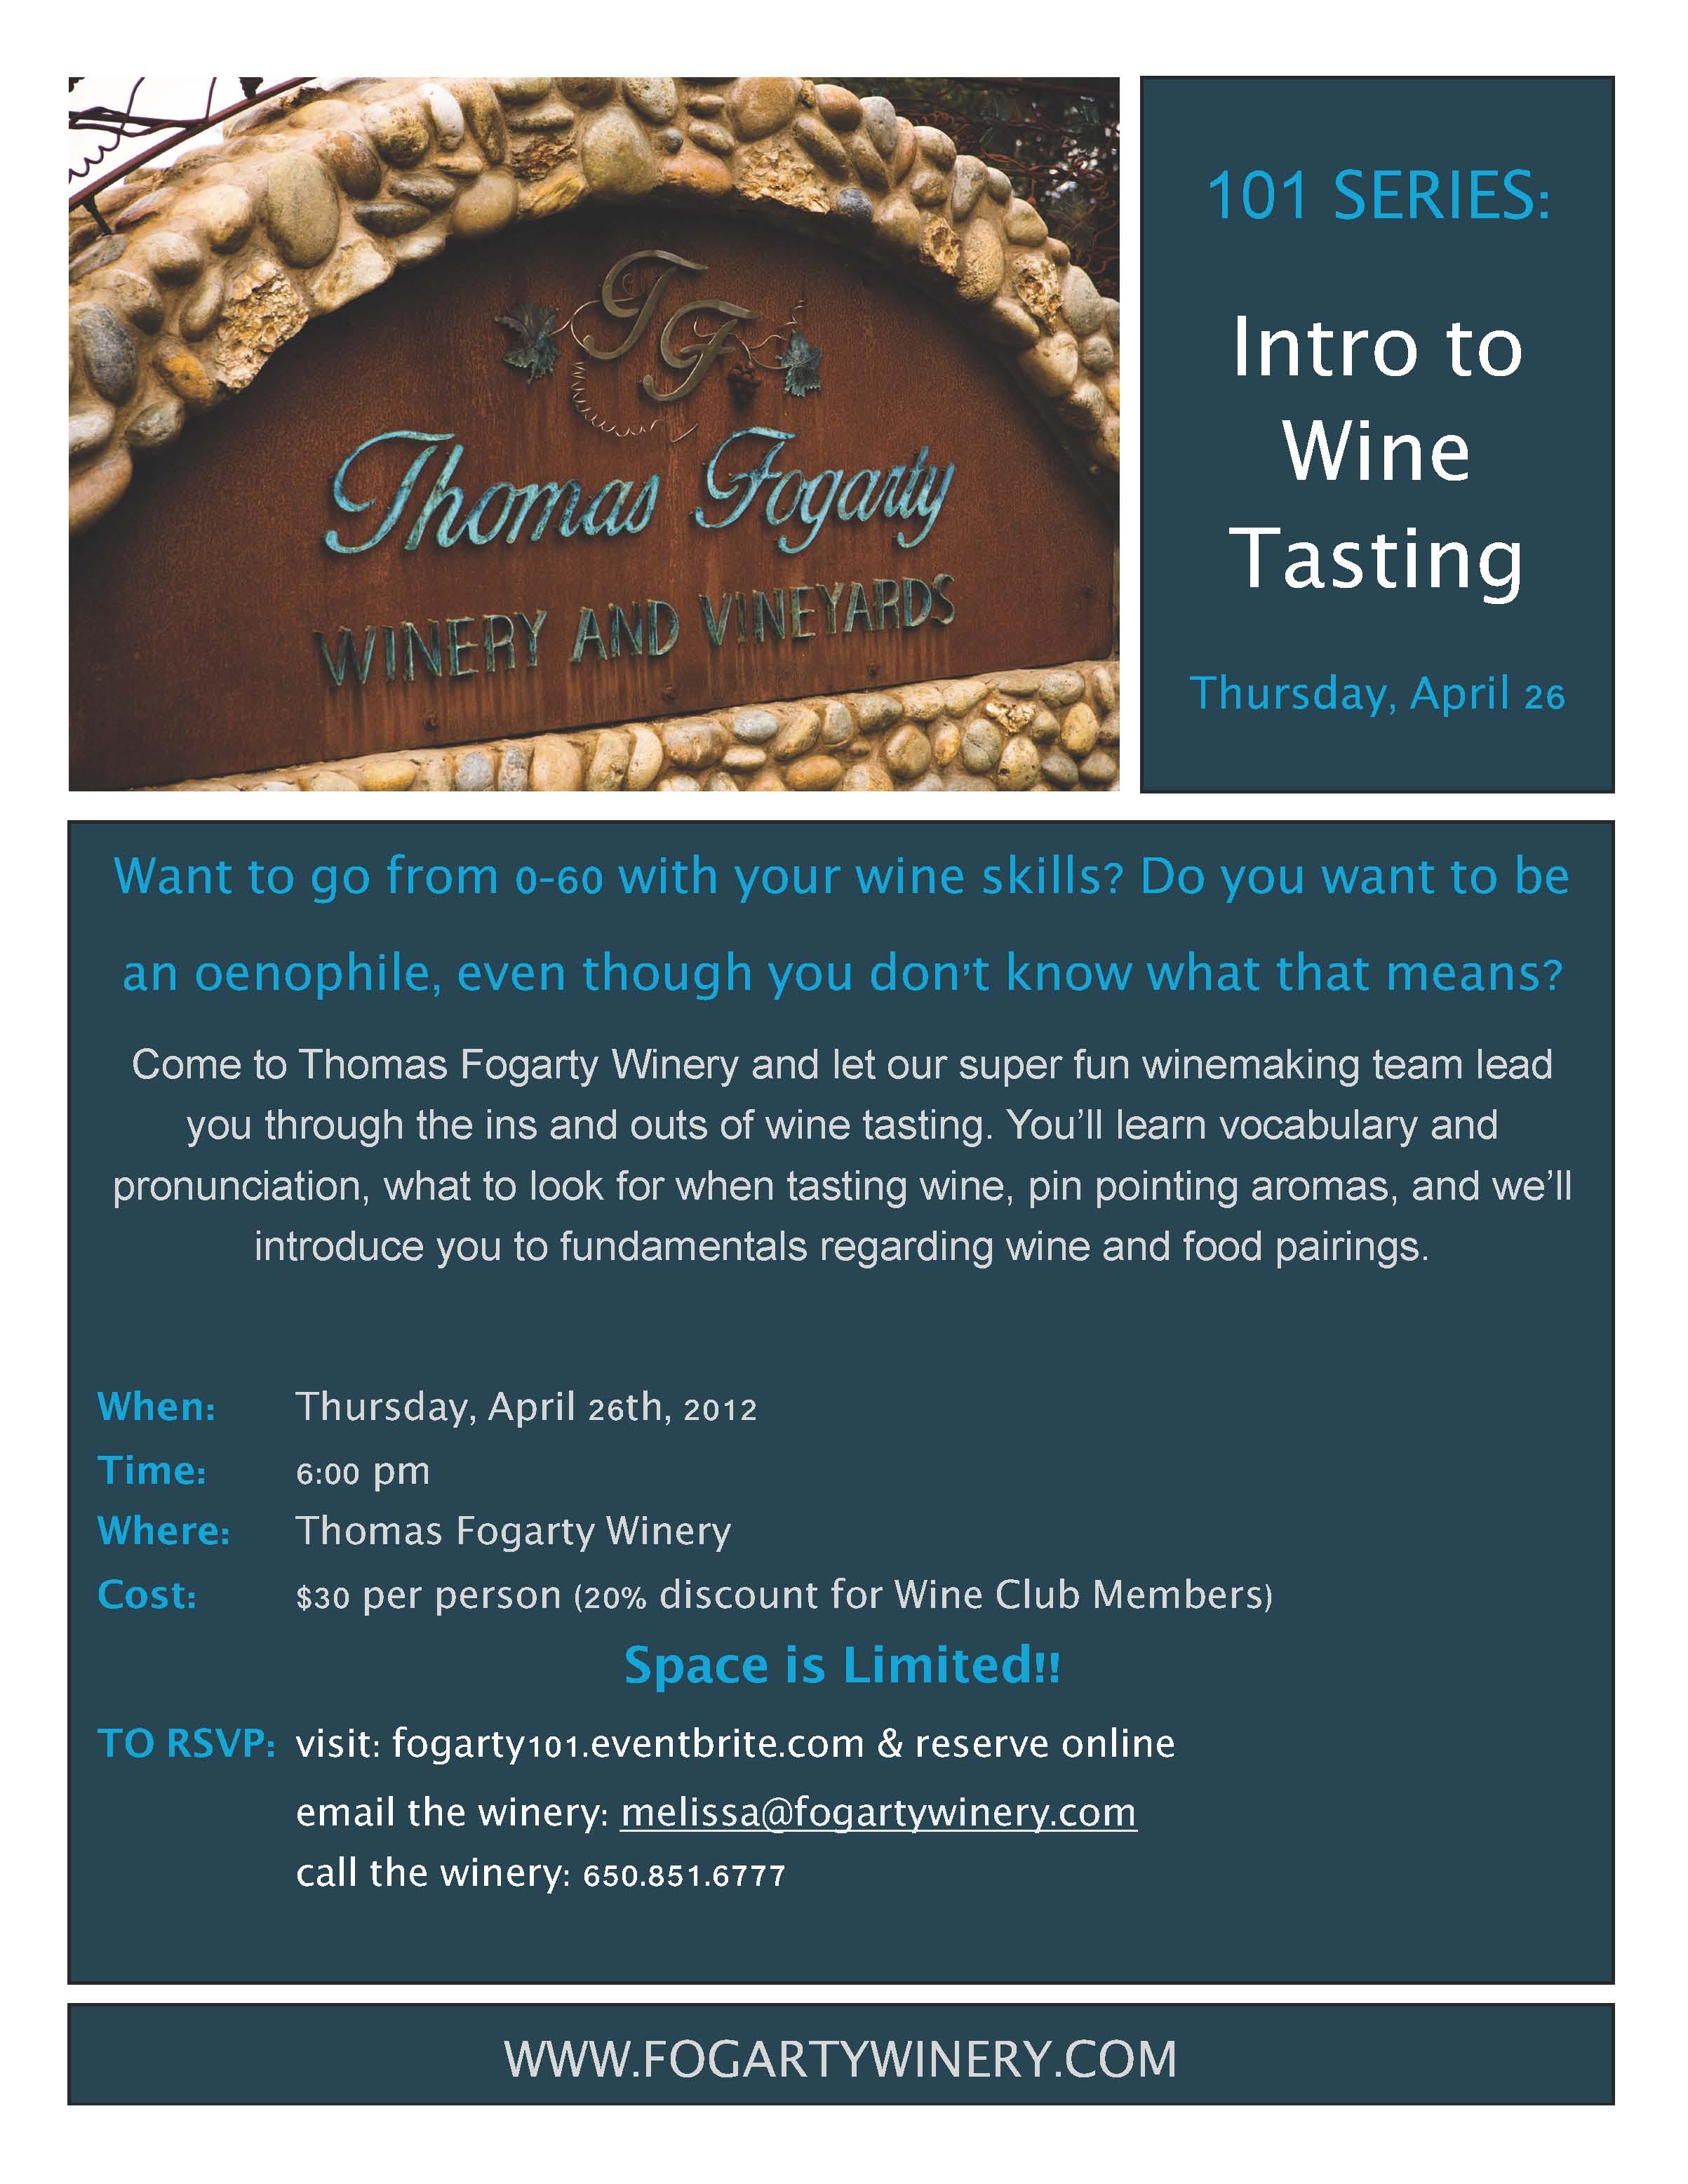 101 Series: Intro To Wine Tasting